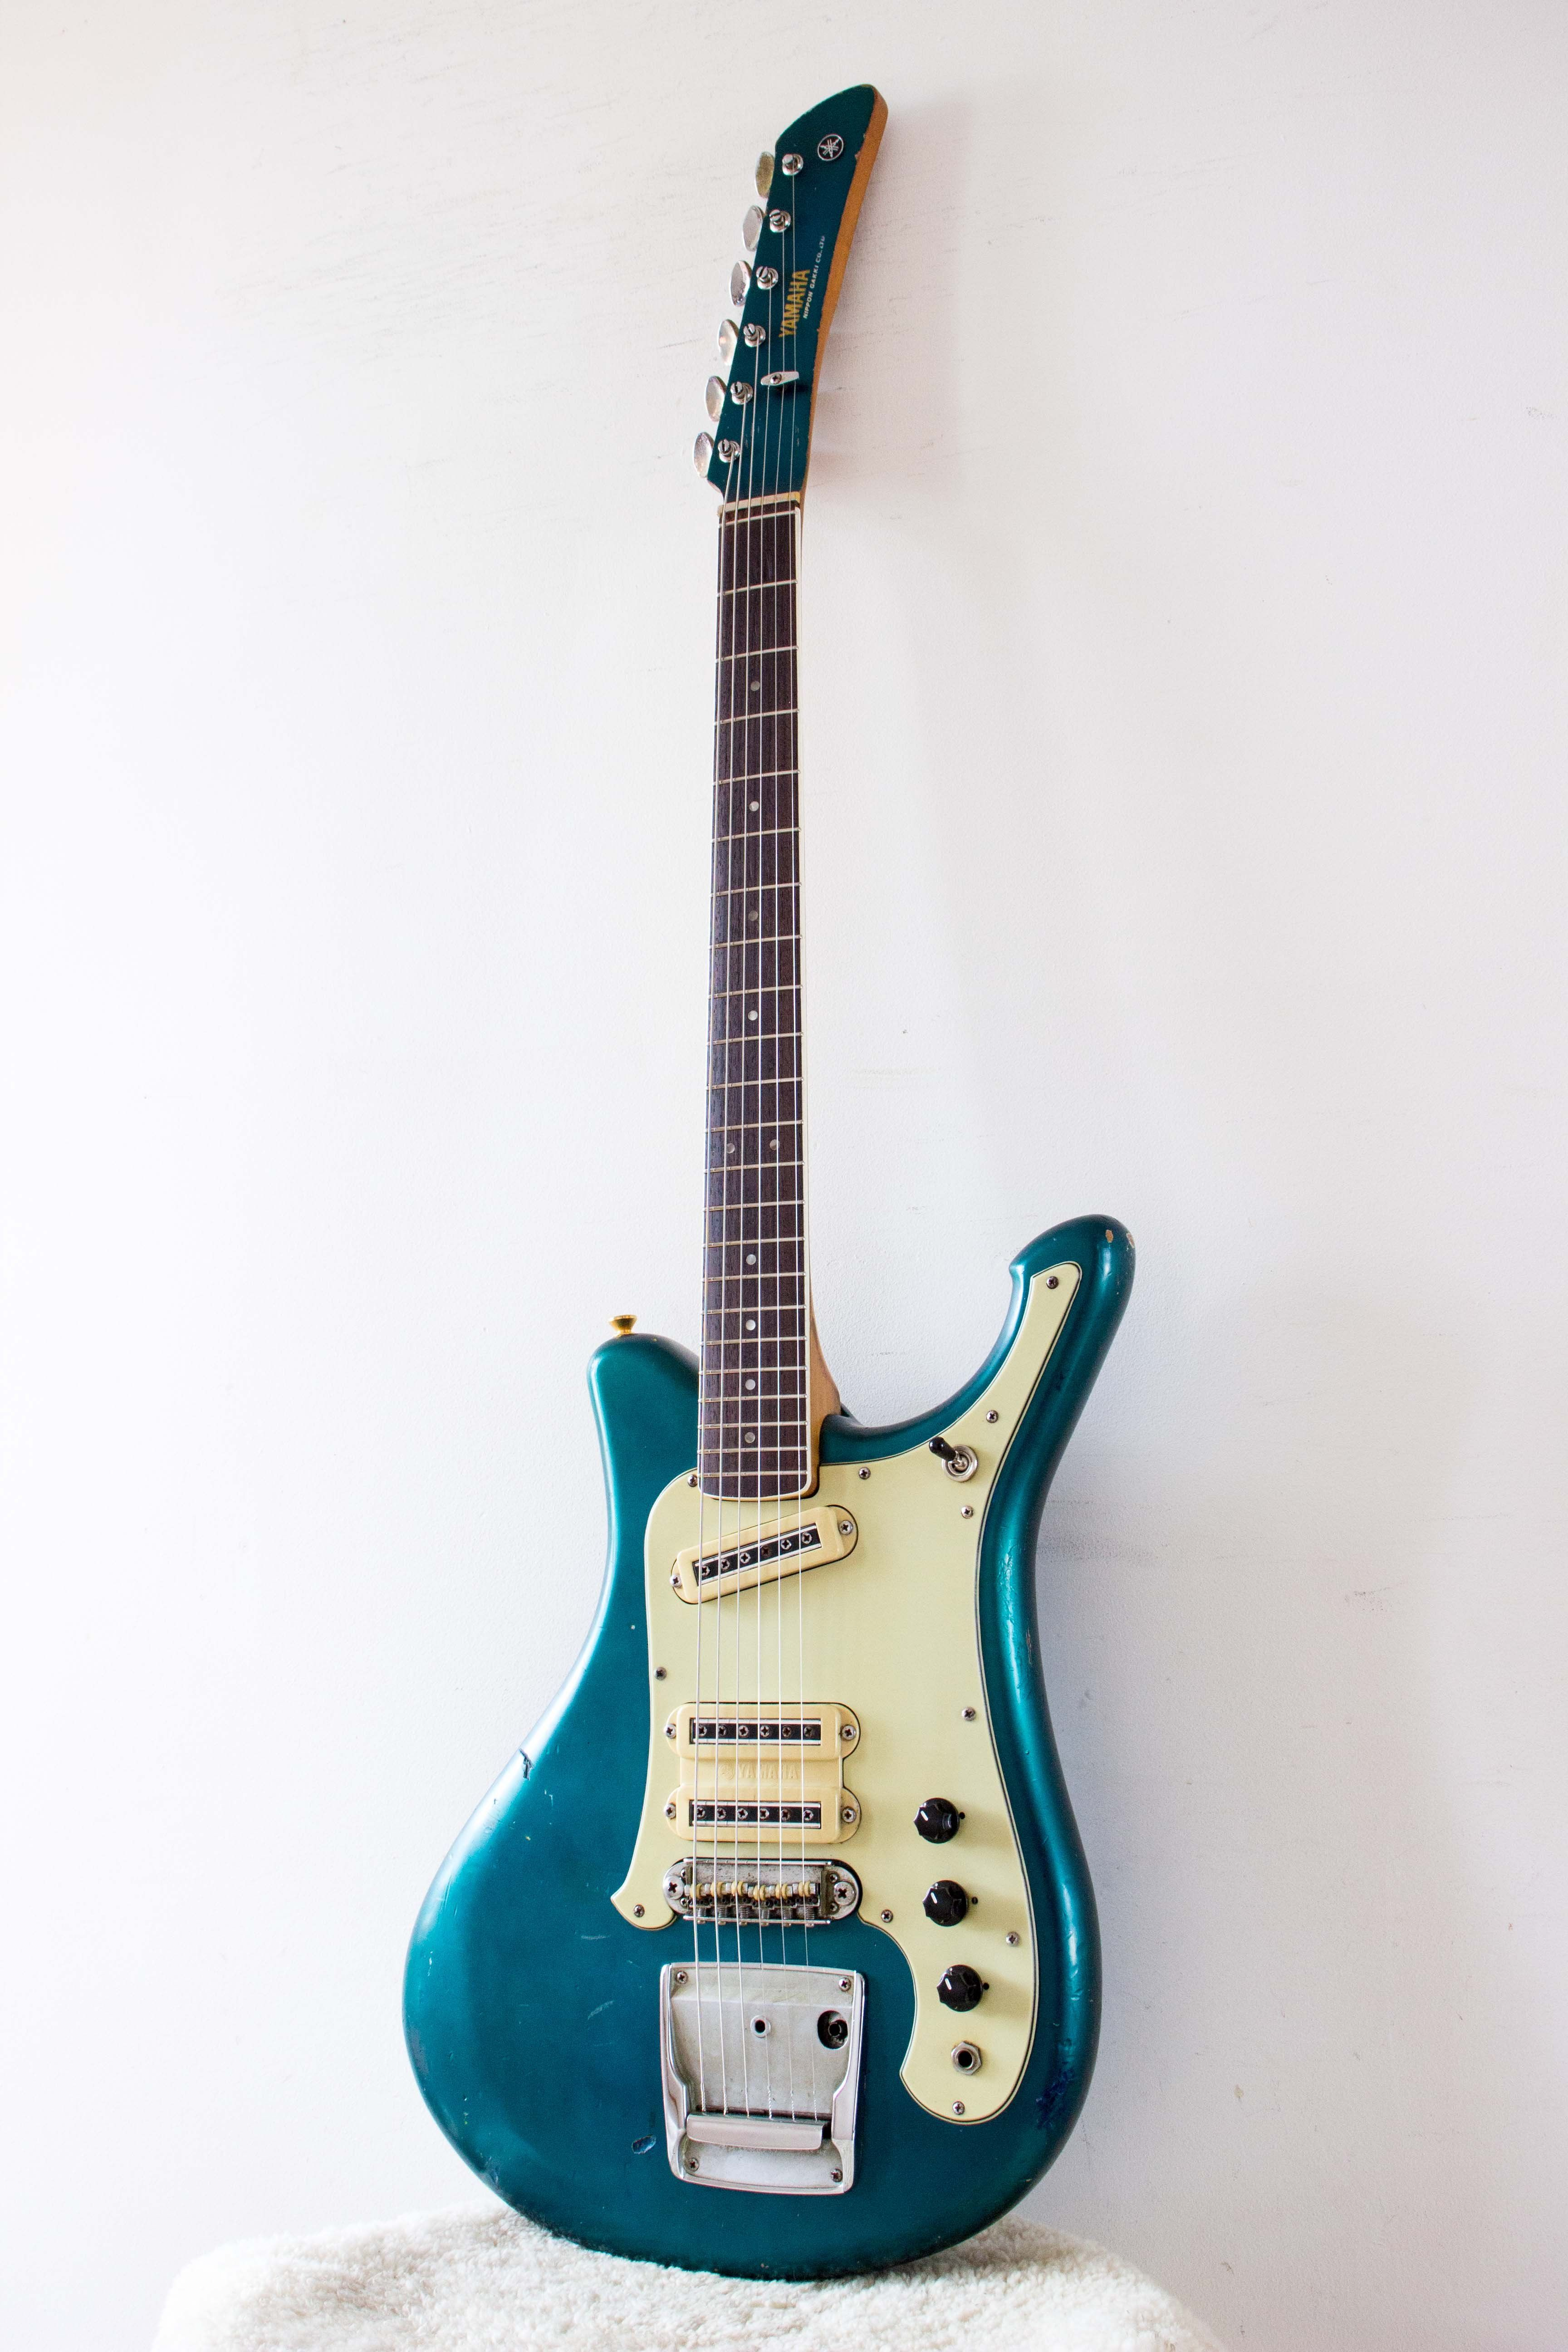 Yamaha Sg 5a Flying Samurai Pearl Blue 1968 Topshelf Instruments Reverb Yamaha Samurai Guitar